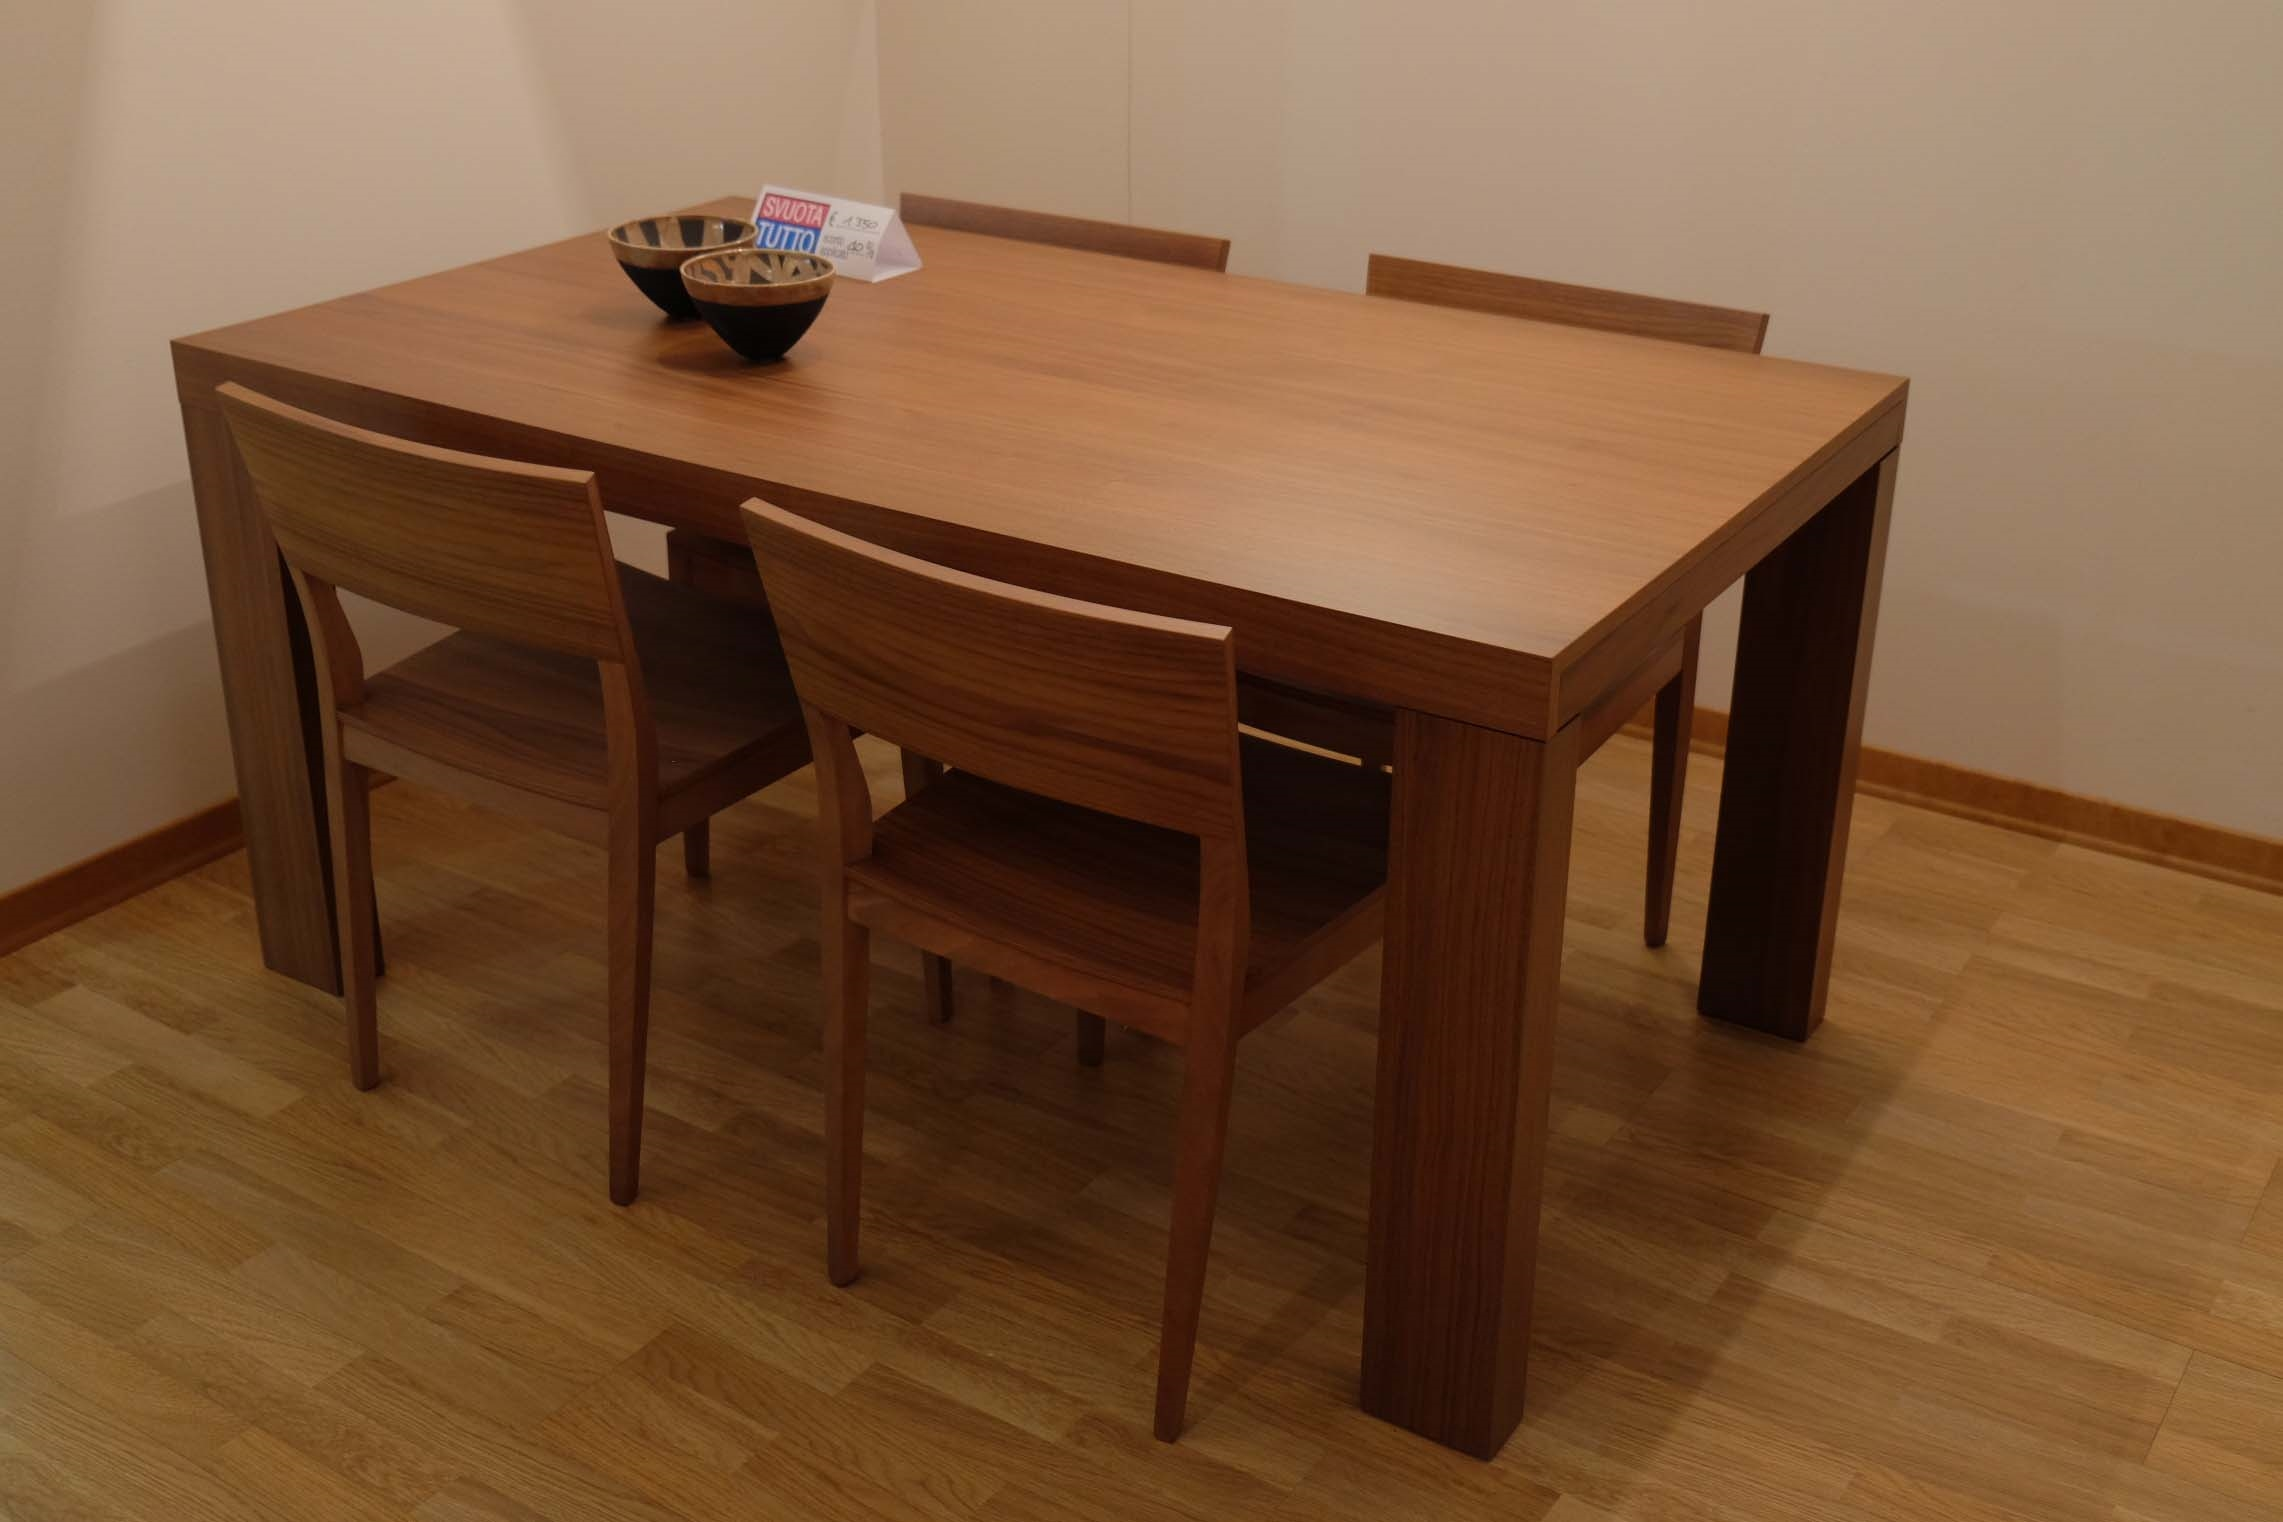 Tavolo jesse tranoi sedie margot scontato del 57 - Dwg tavolo con sedie ...